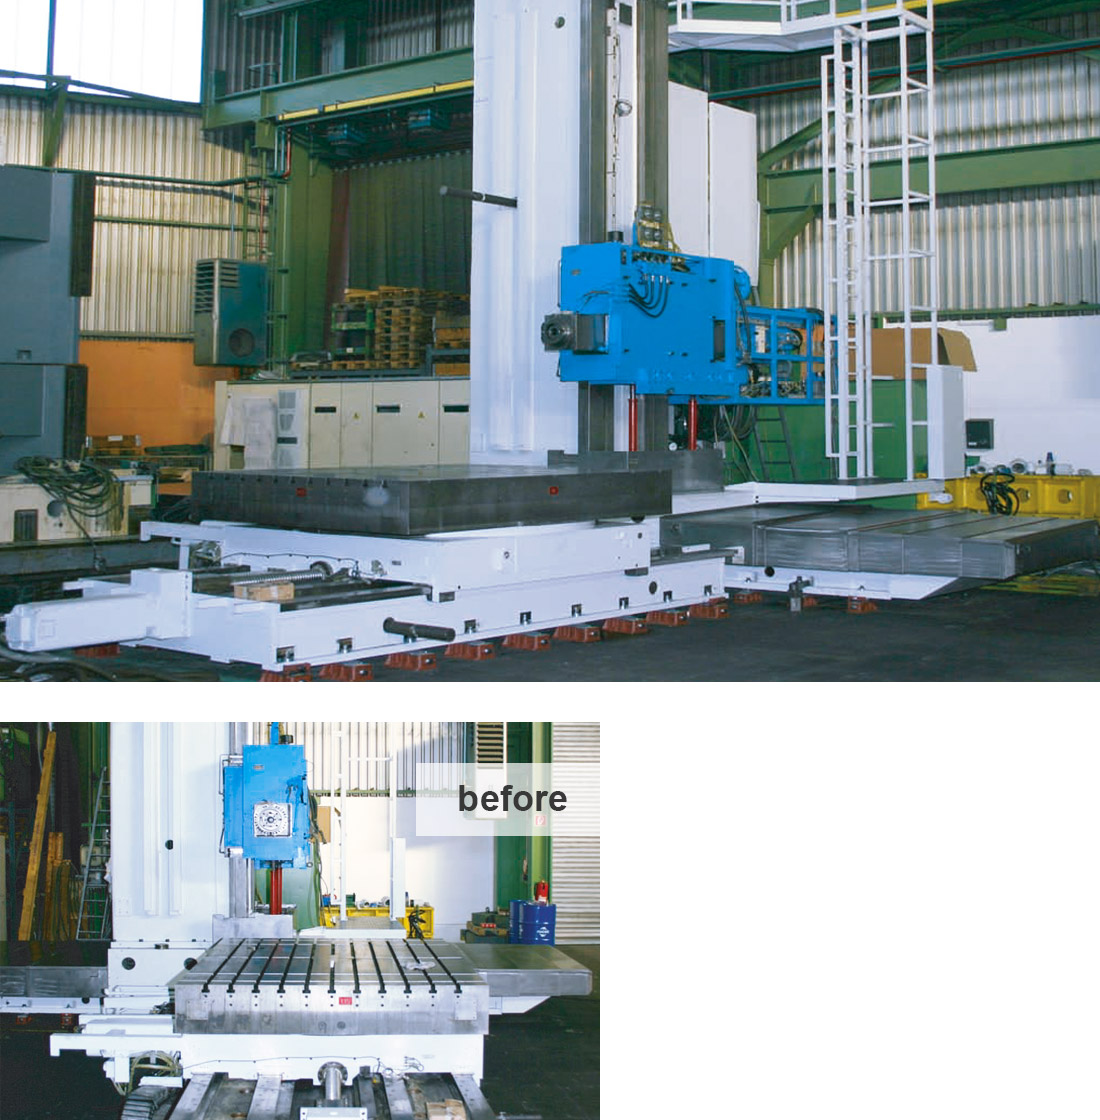 EDM Technik, Dörries machine tool production, Machine tool modernization, Increase of Productivity